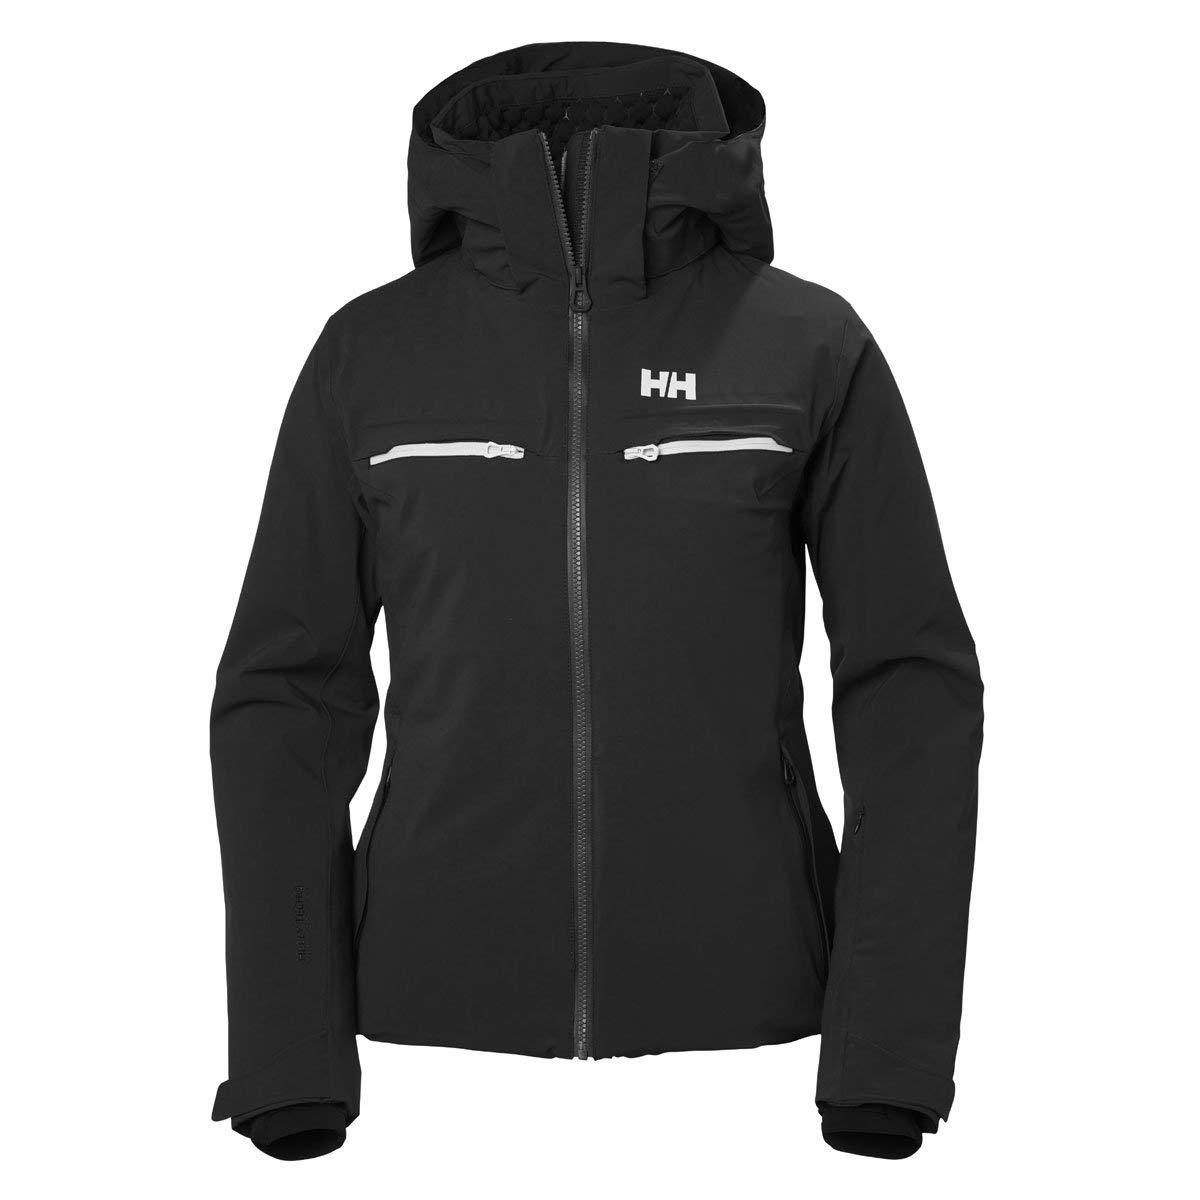 TALLA XS. Helly Hansen W Alphelia Ins Jacket, Mujer, Black, XS